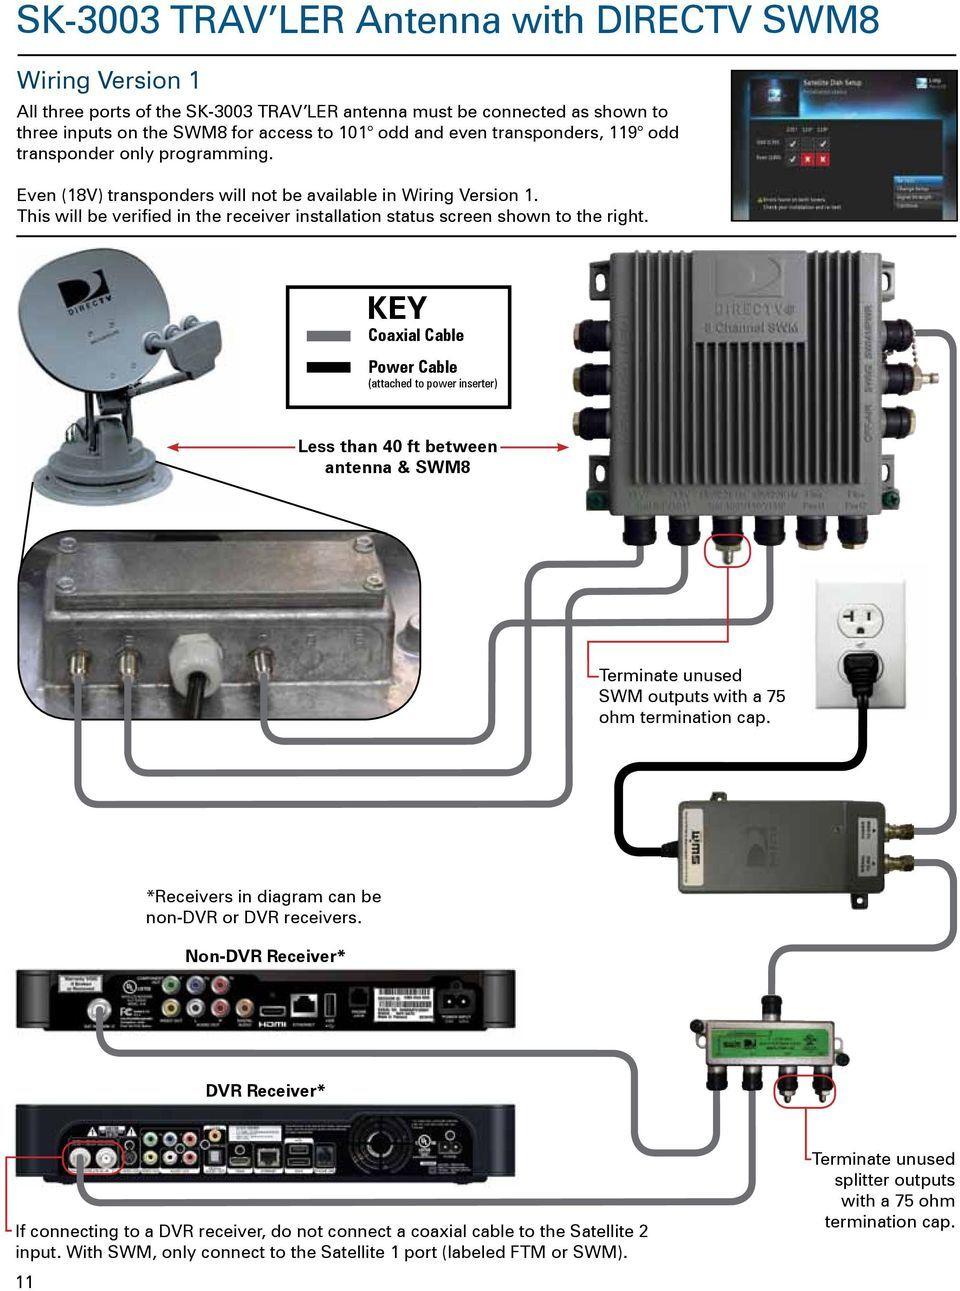 Directv Wiring Diagram — Kejomoro Fresh Ideas - Directv Swm Splitter Wiring Diagram